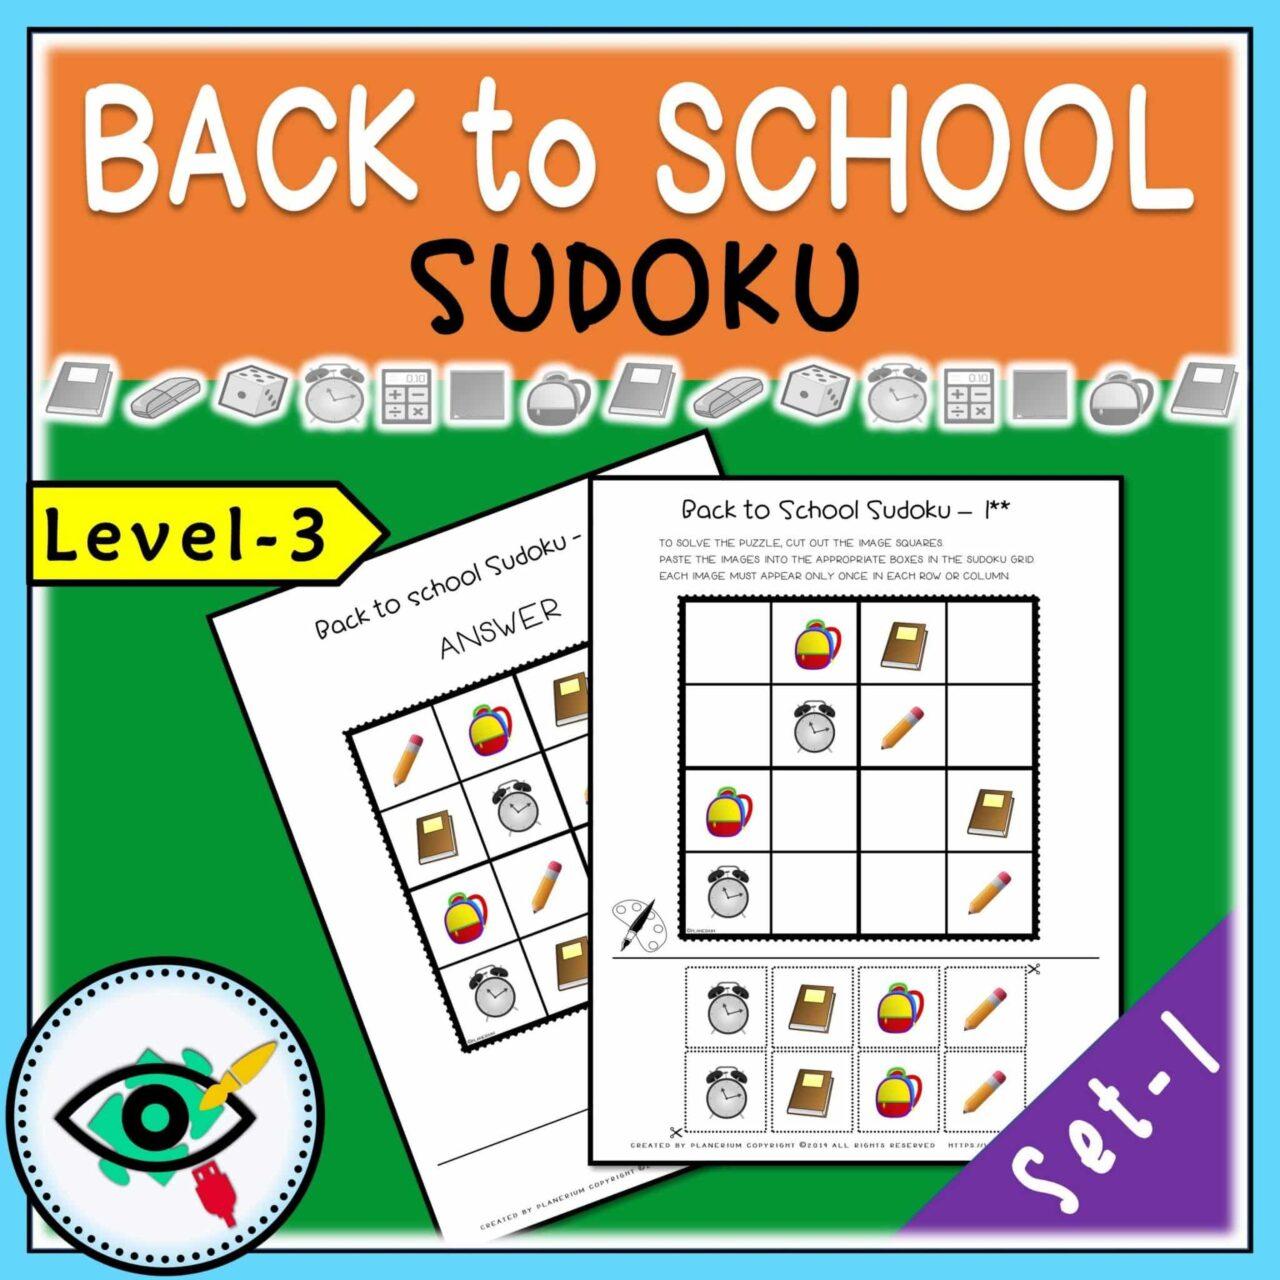 Back to School - Sudoku - Title 3 | Planerium